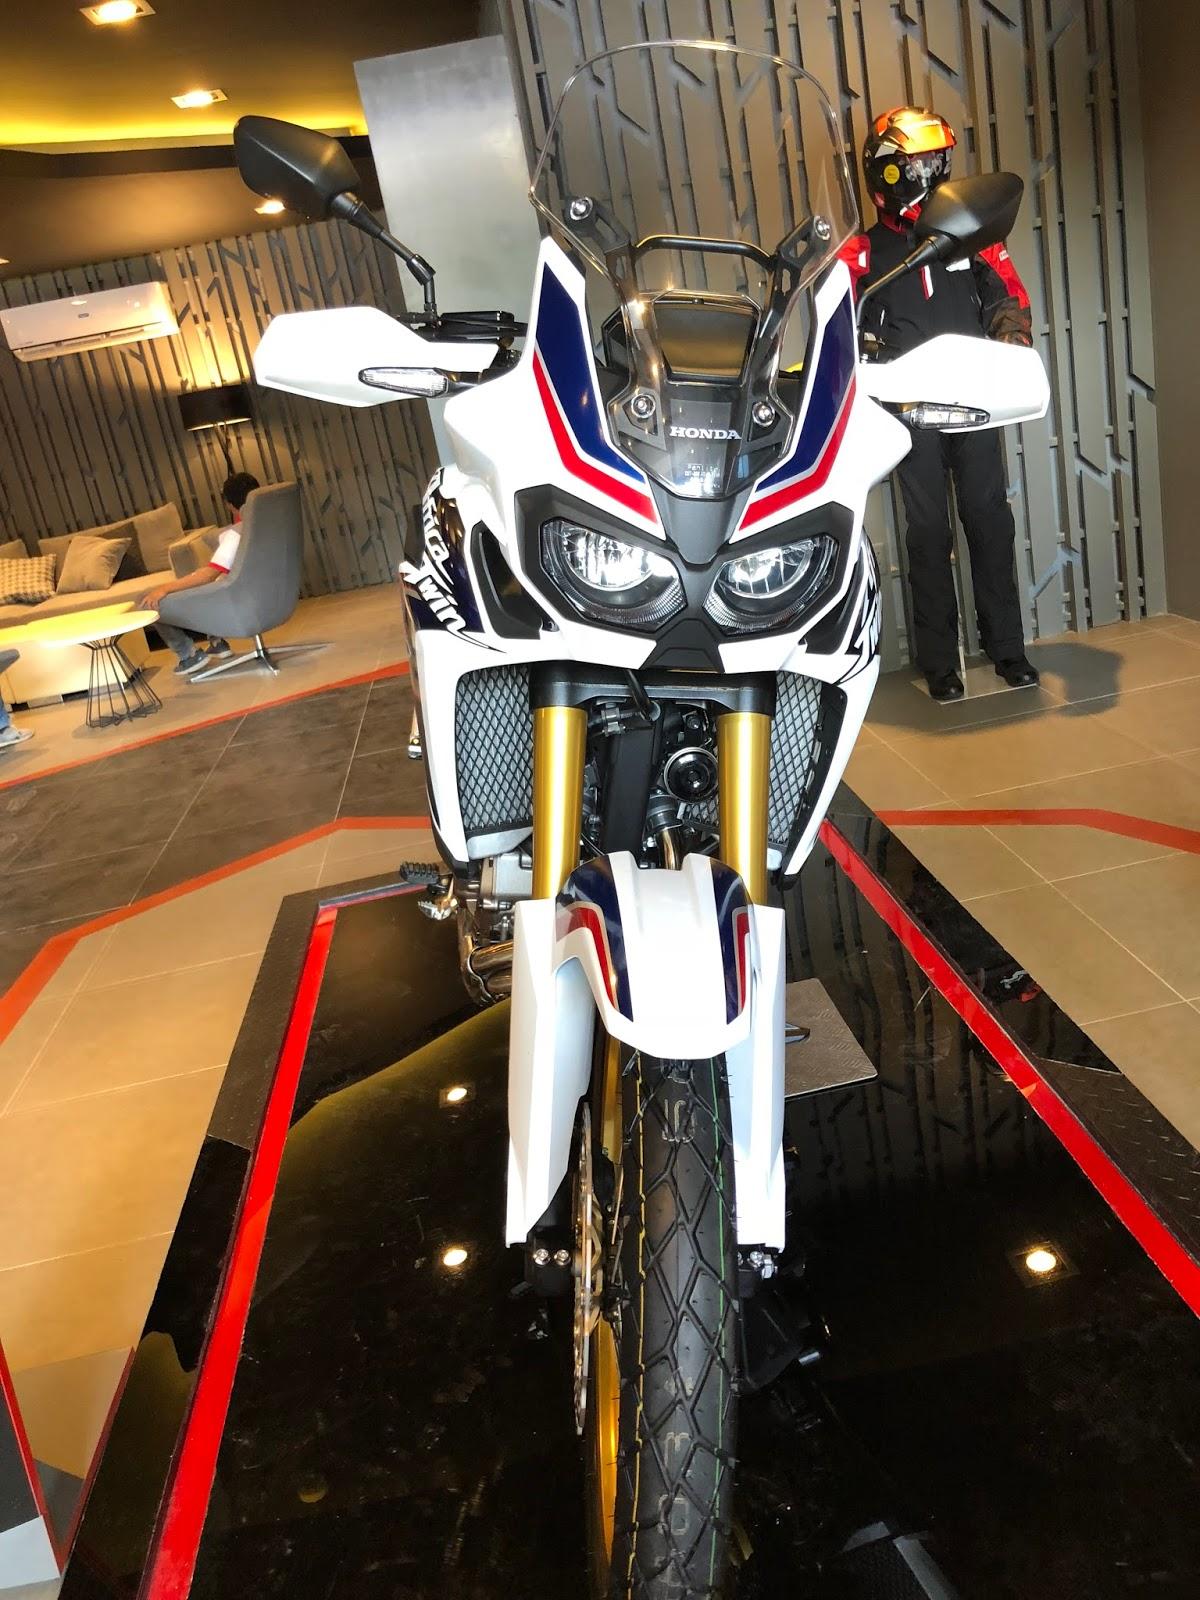 For More Information On Honda Big Bikes And Flagship Shops Visit Hondaph Or Like Hondas Official Facebook Page At HondaPH